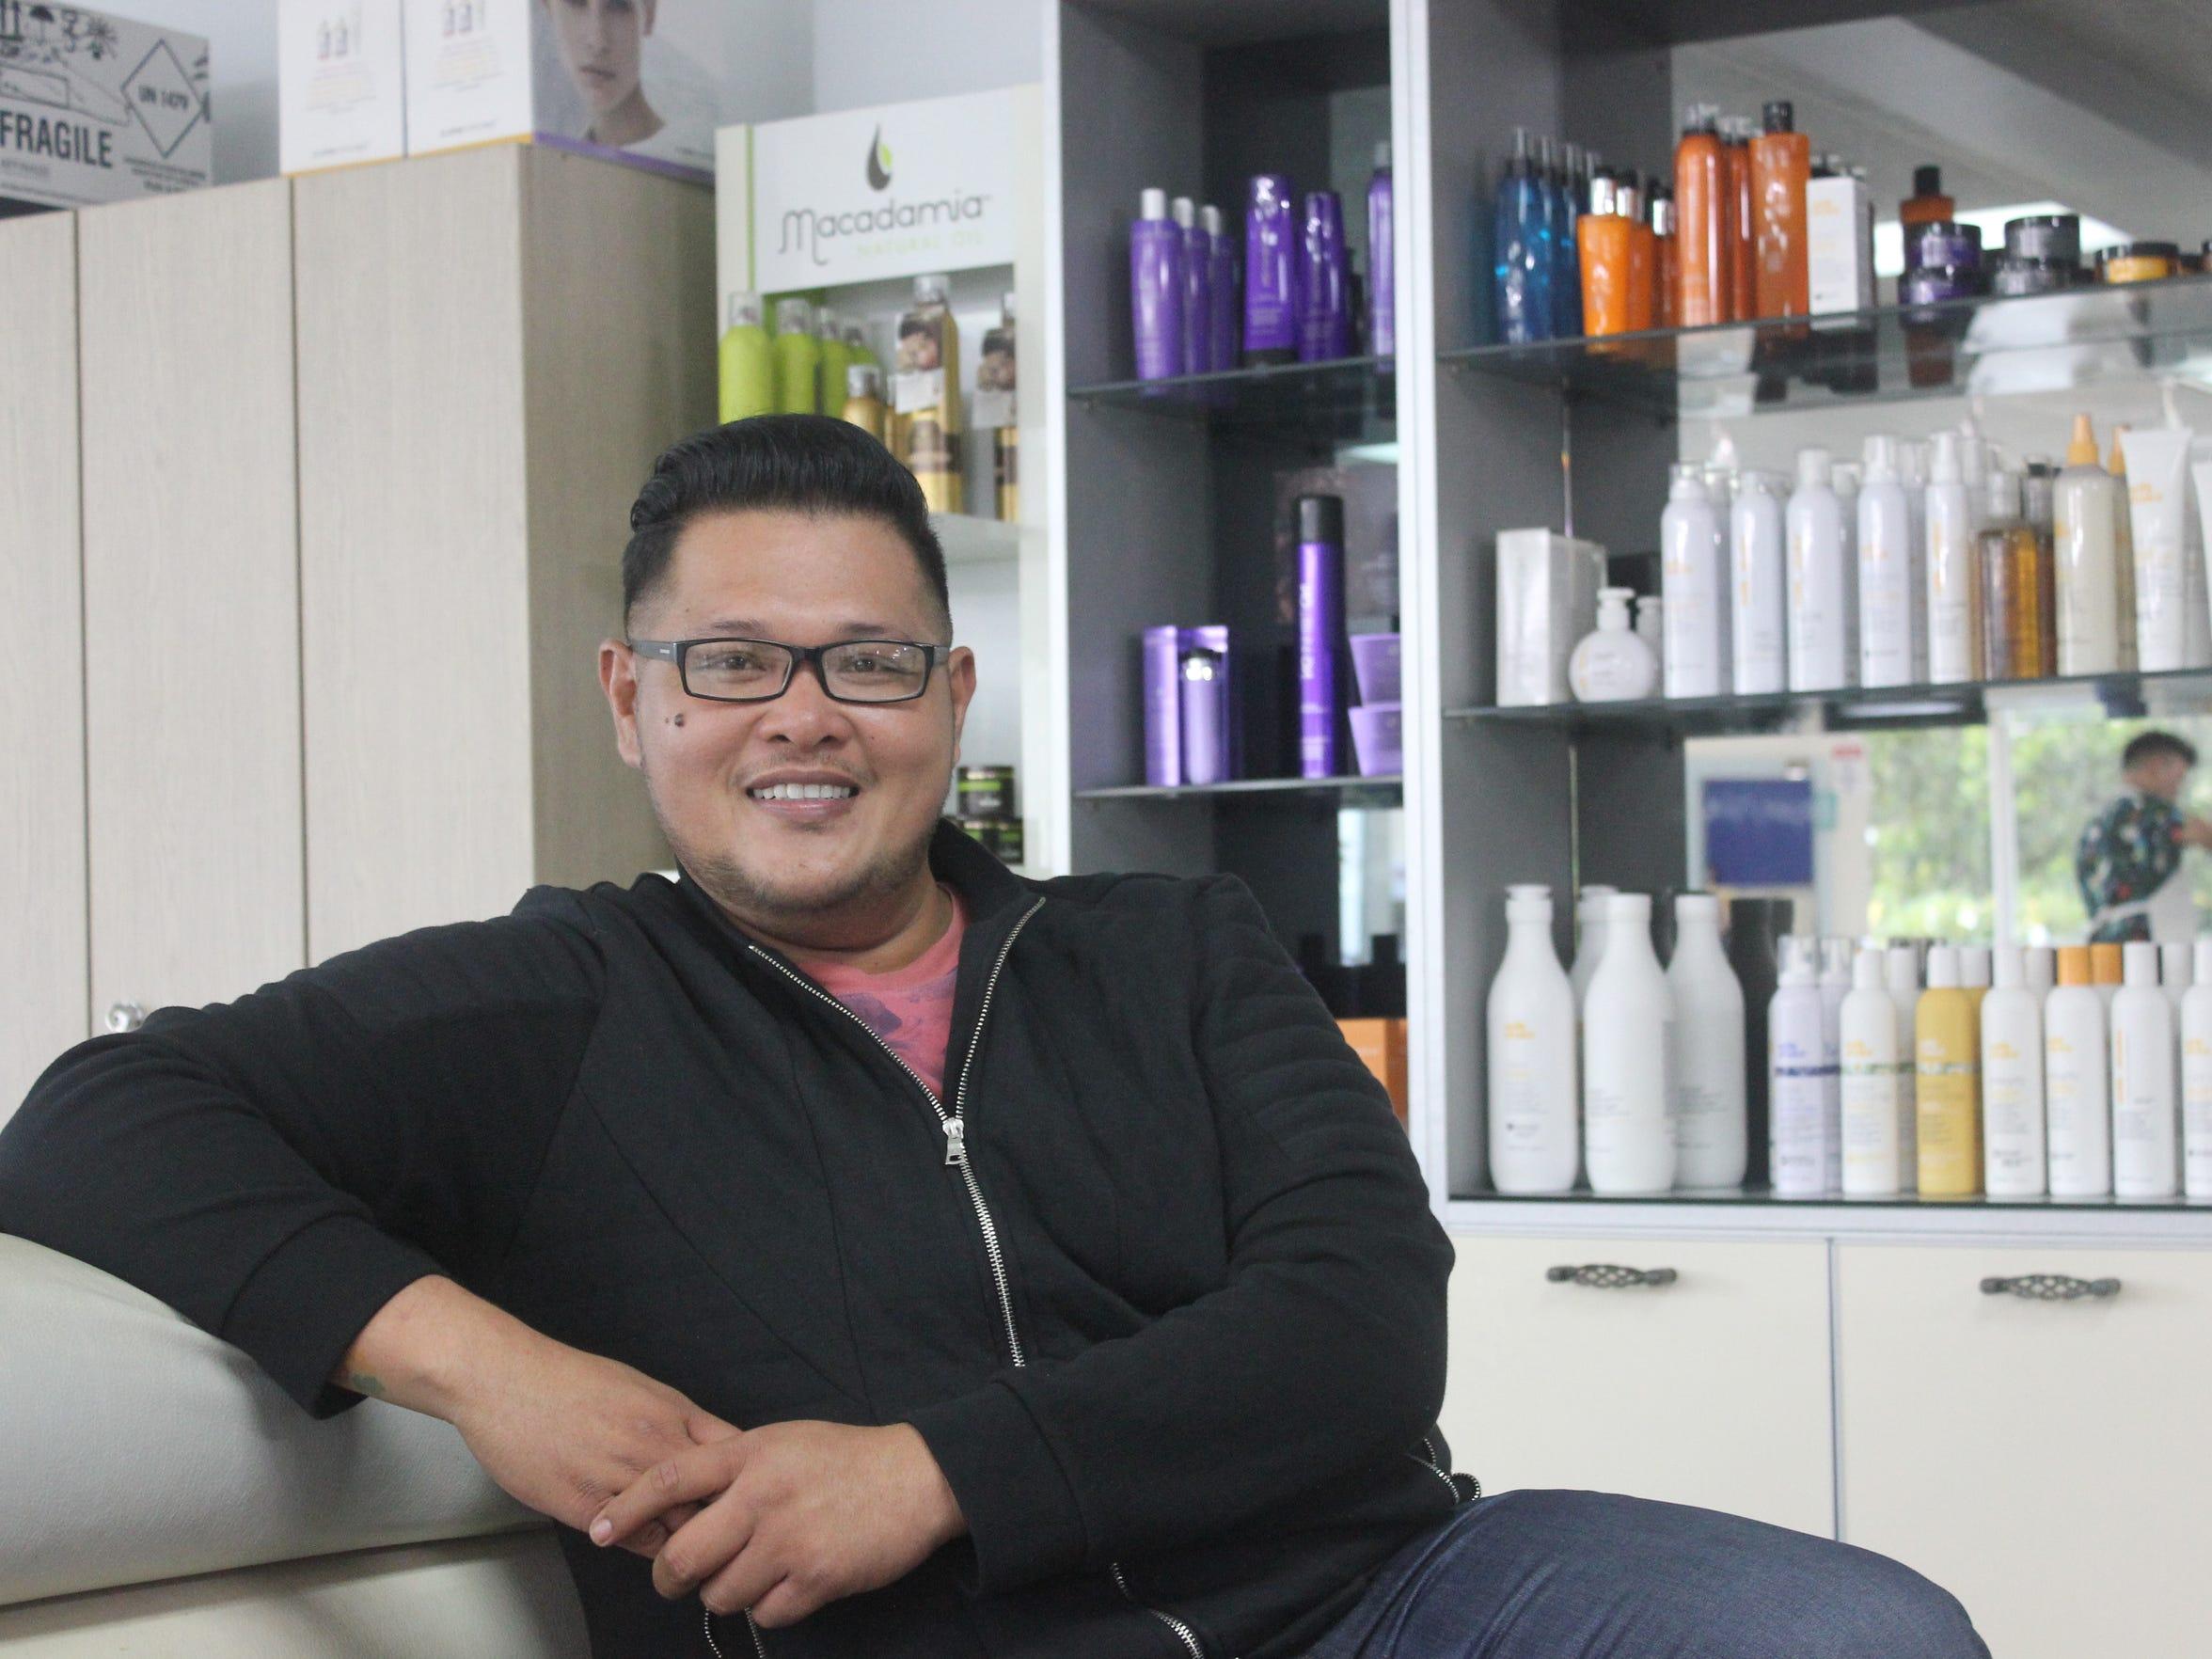 Andrew Hernandez at Oceans Salon wins Best Hair Stylist.